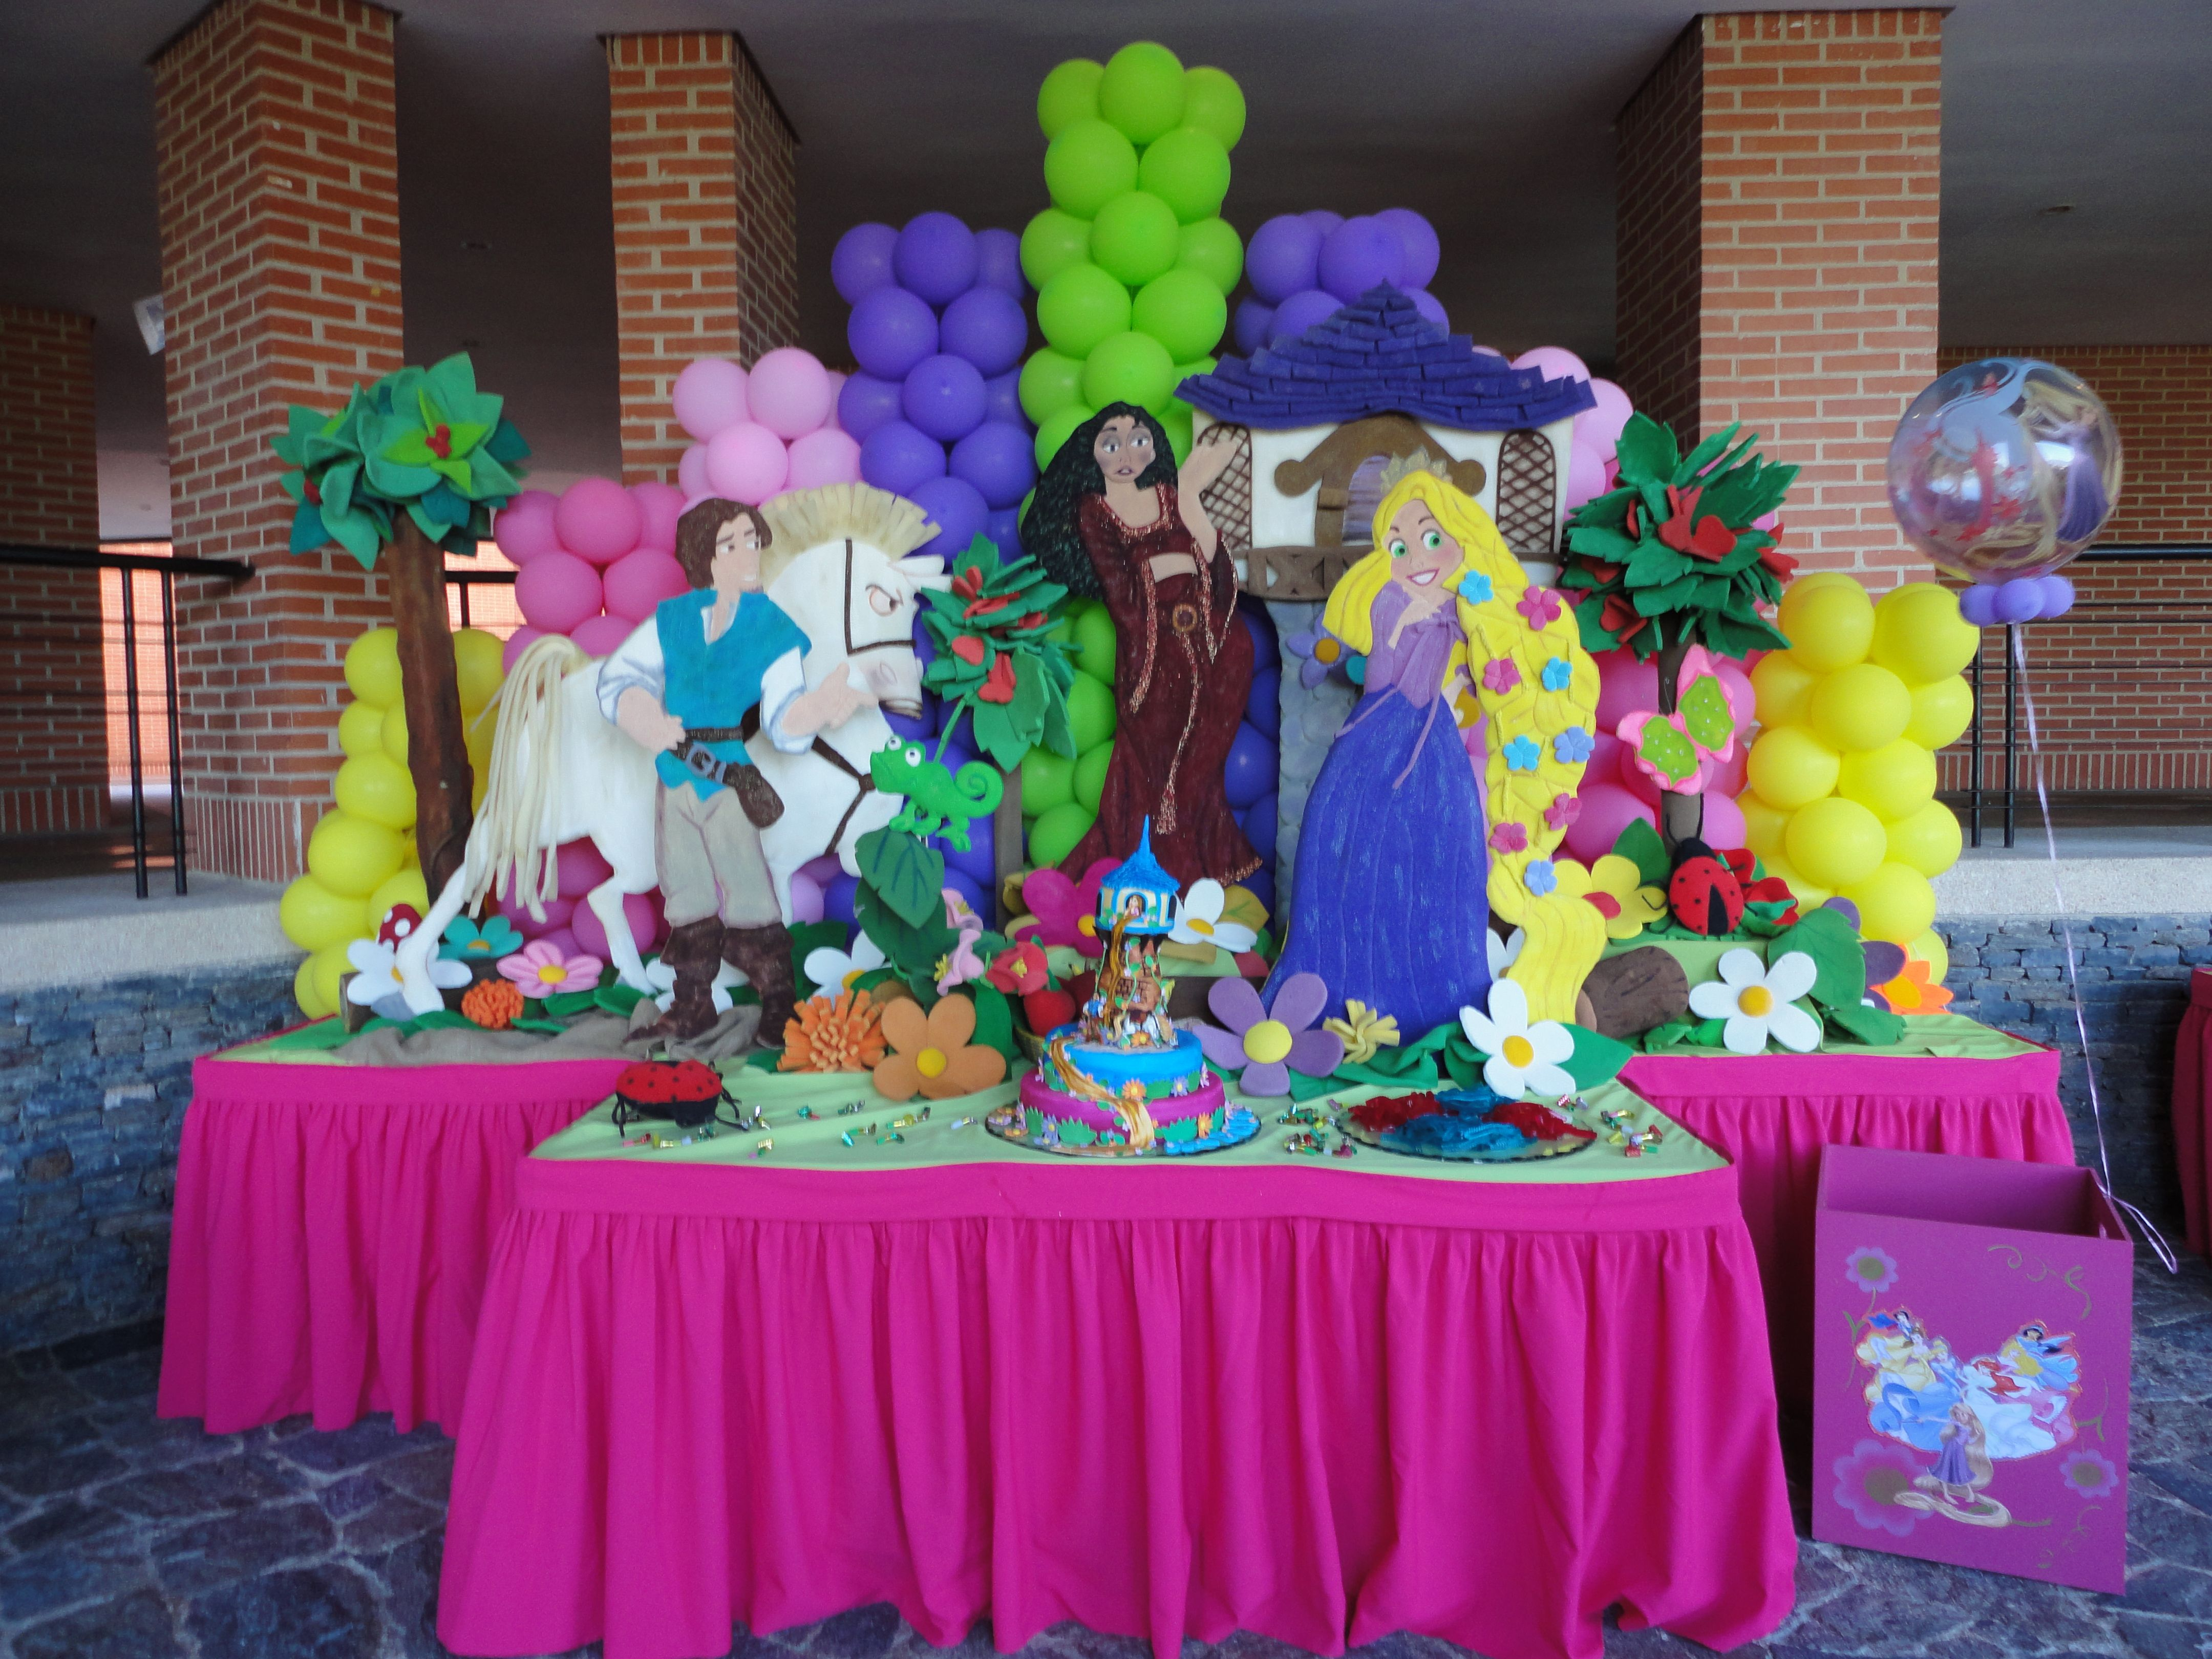 Decoracion de fiestas infantiles decoracion de toys - Ideas decoracion fiesta ...